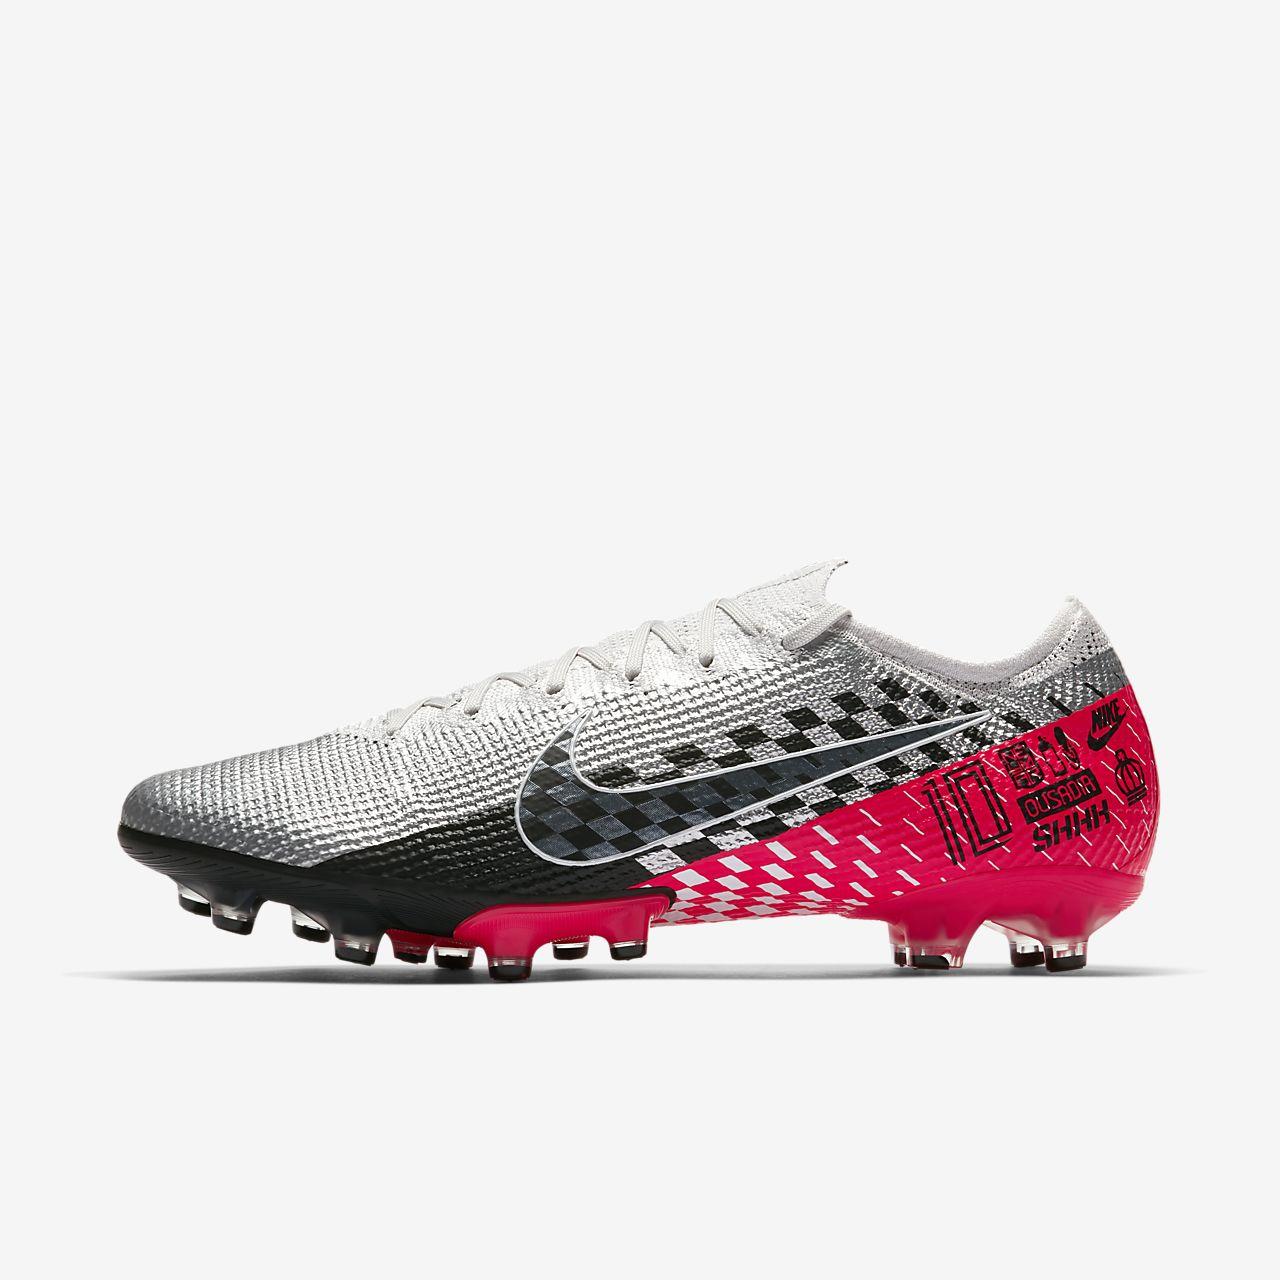 Scarpa da calcio per erba artificiale Nike Mercurial Vapor 13 Elite Neymar Jr. AG-PRO